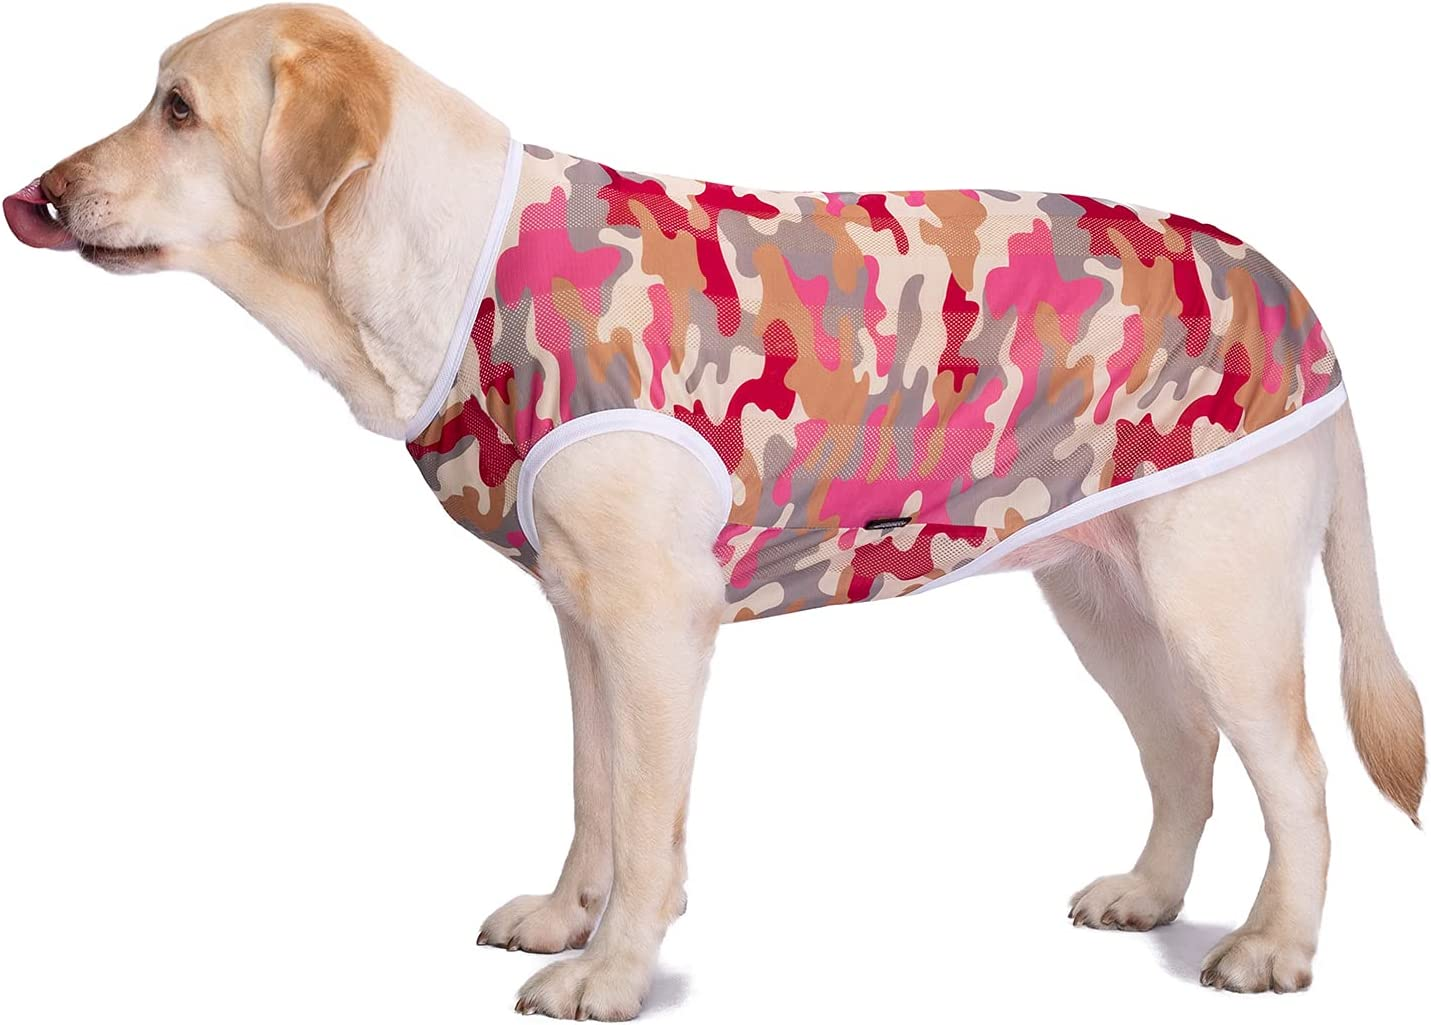 Pet Clothes Dog Shirt Camouflage Summer Vest T-Shirt Excellent Ranking TOP19 Sunscreen